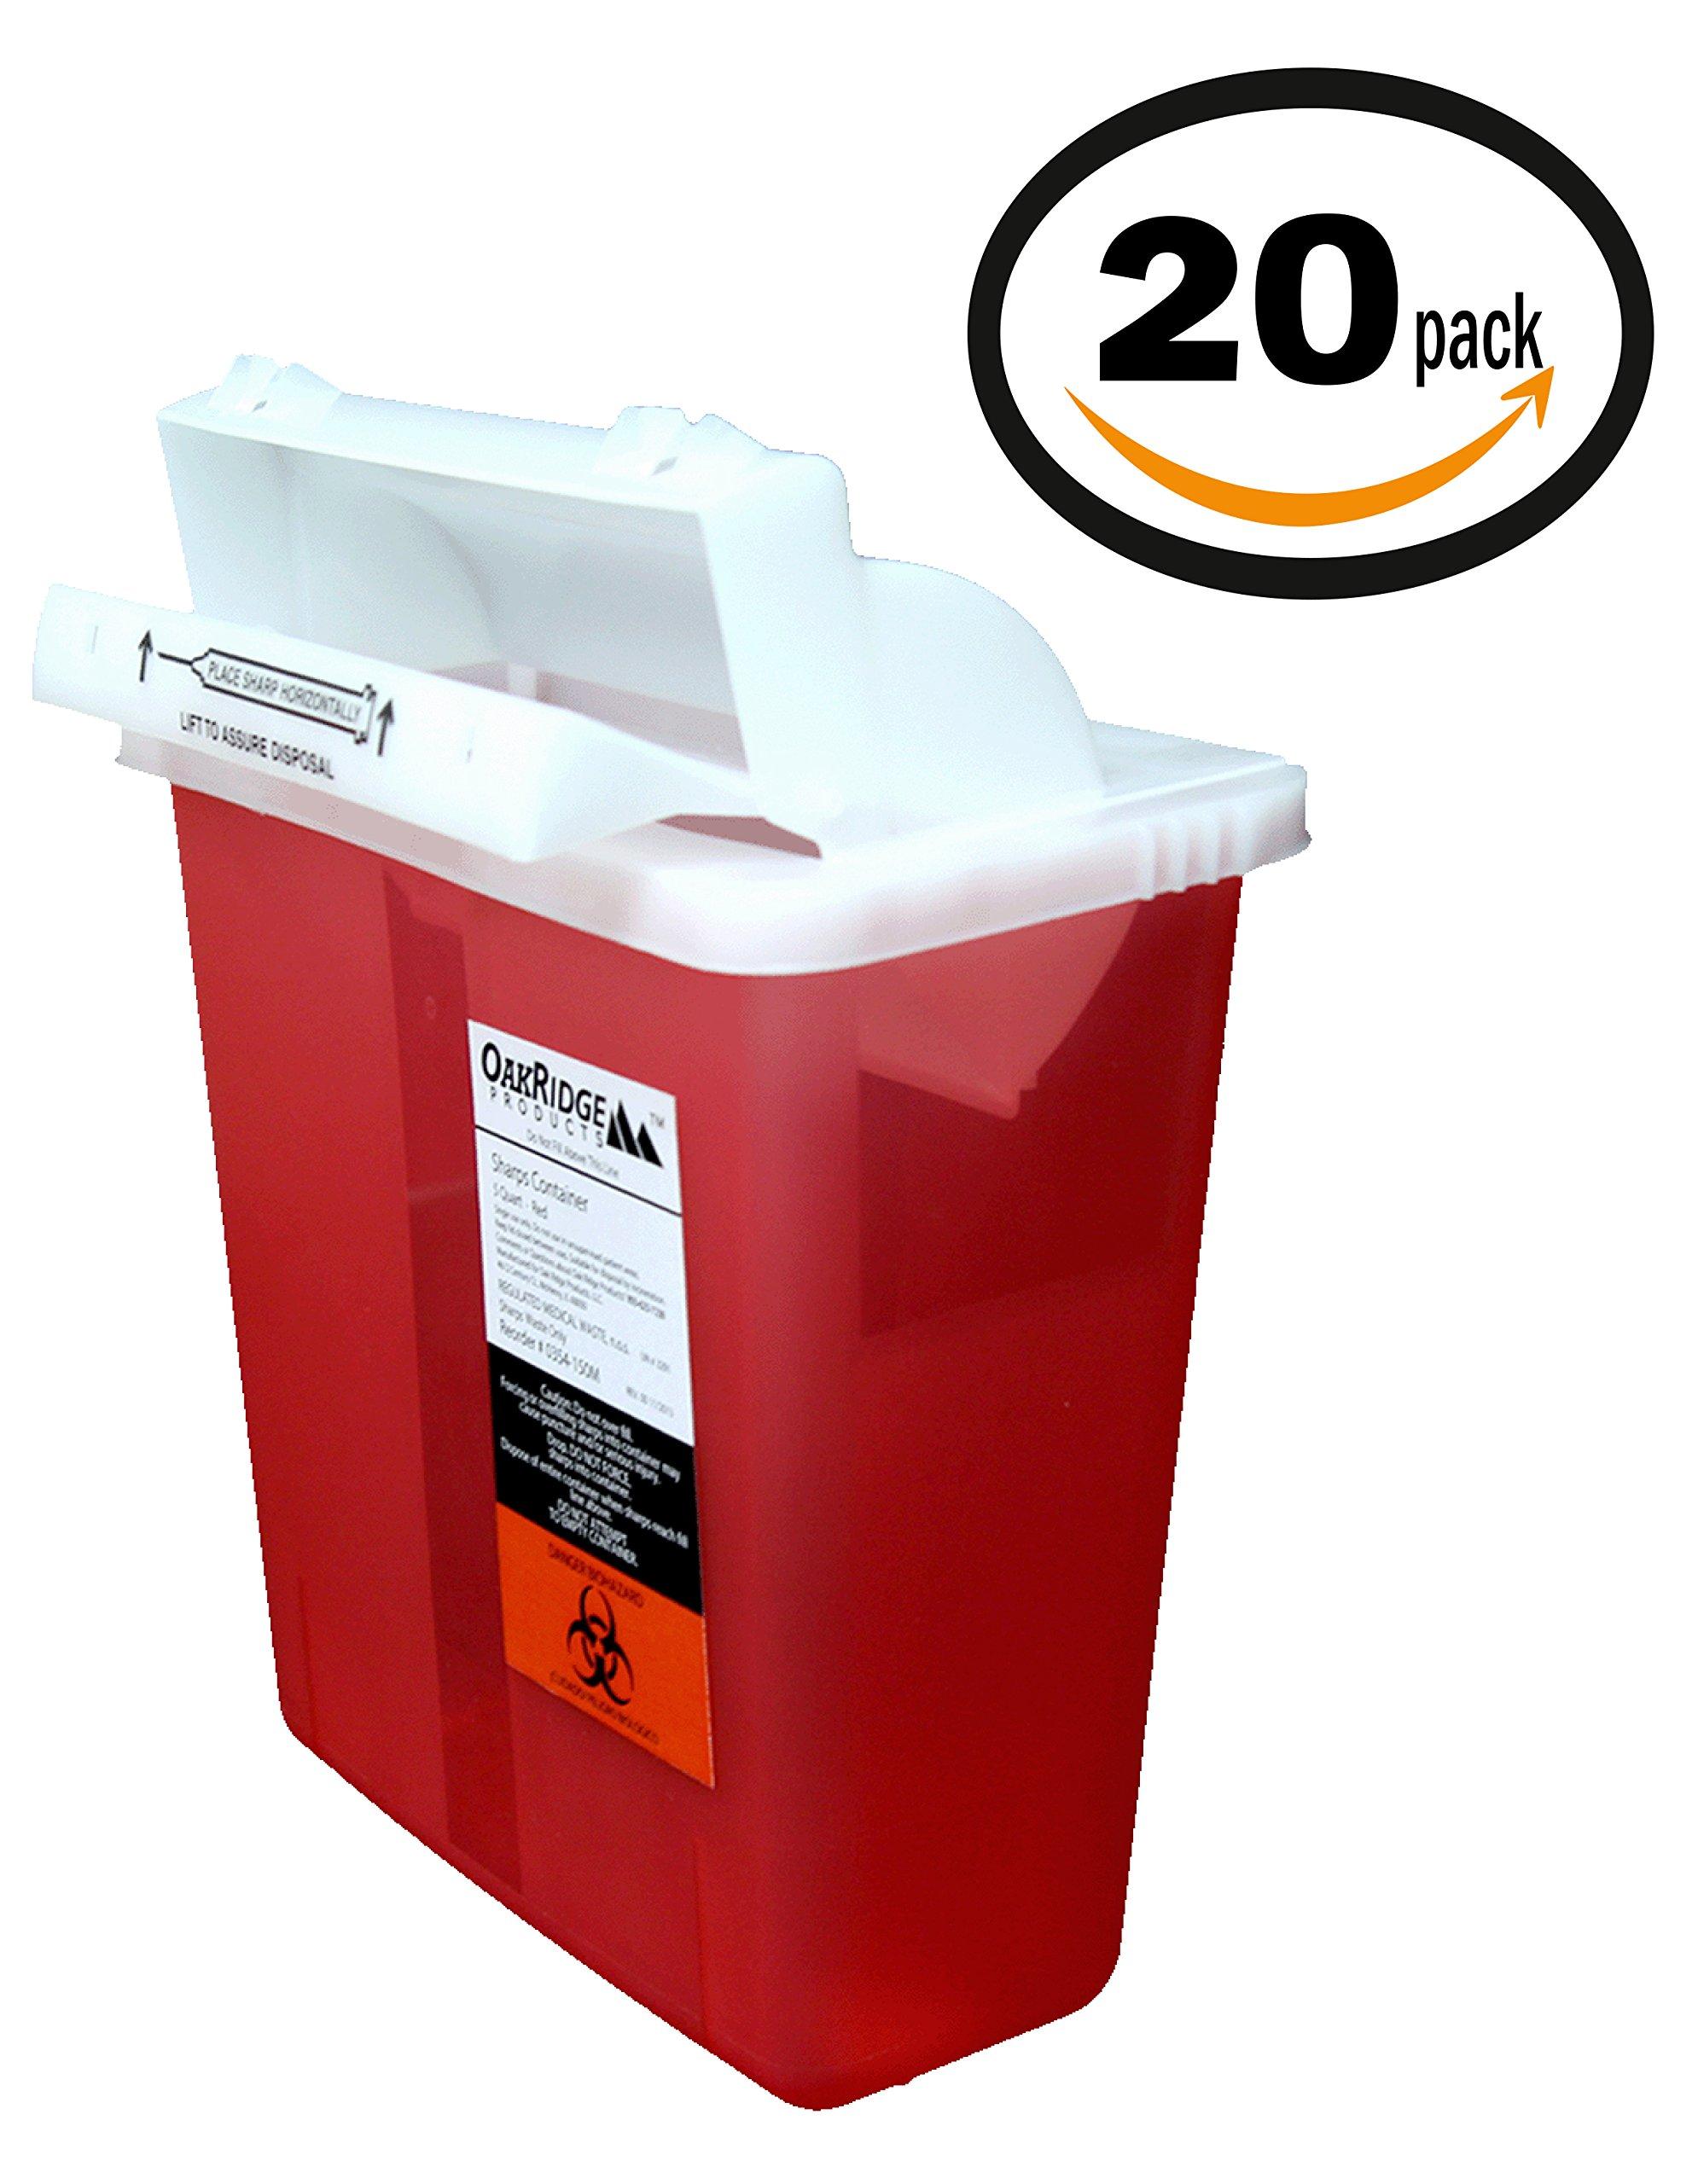 Oakridge 5 Quart Sharps Container (20 Pack) Mailbox Style lid | Business Bundle | Full case